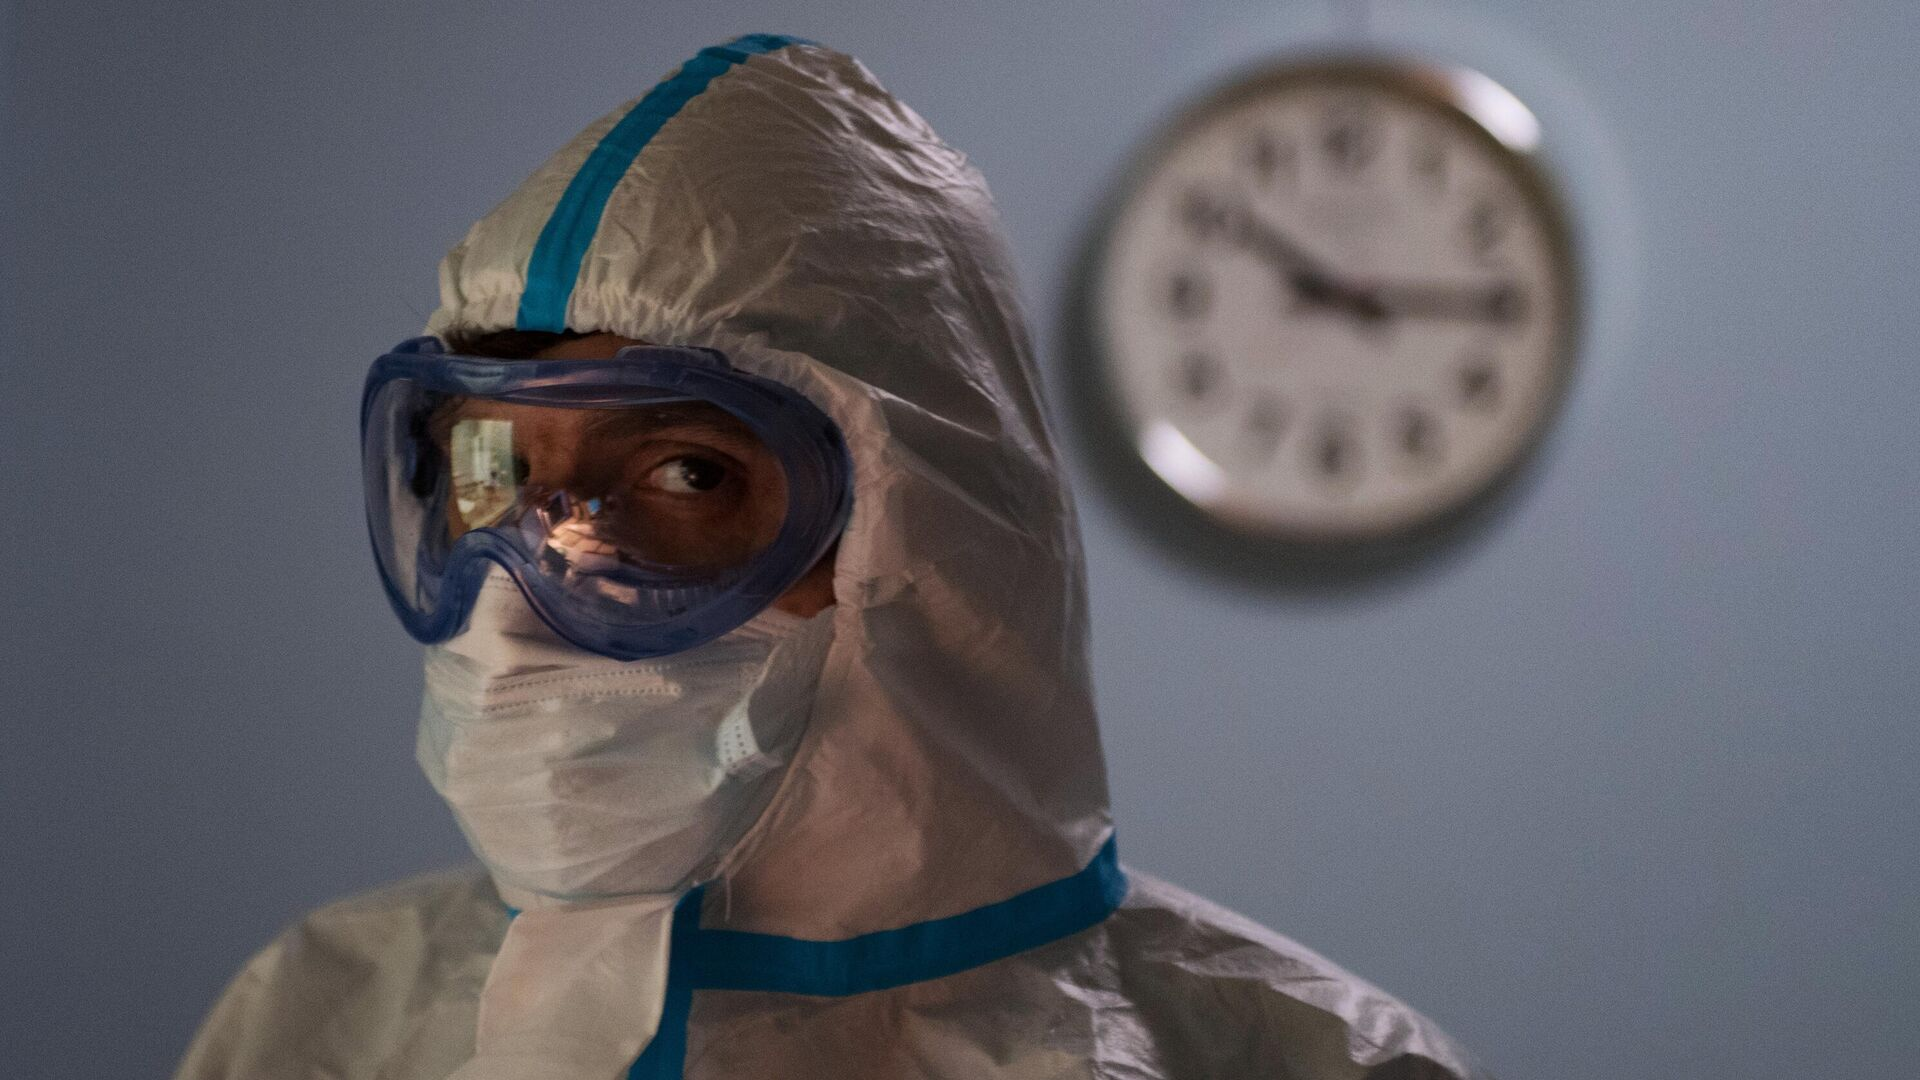 Un médico ruso que atiende casos de coronavirus en un hospital de Rusia - Sputnik Mundo, 1920, 24.03.2021